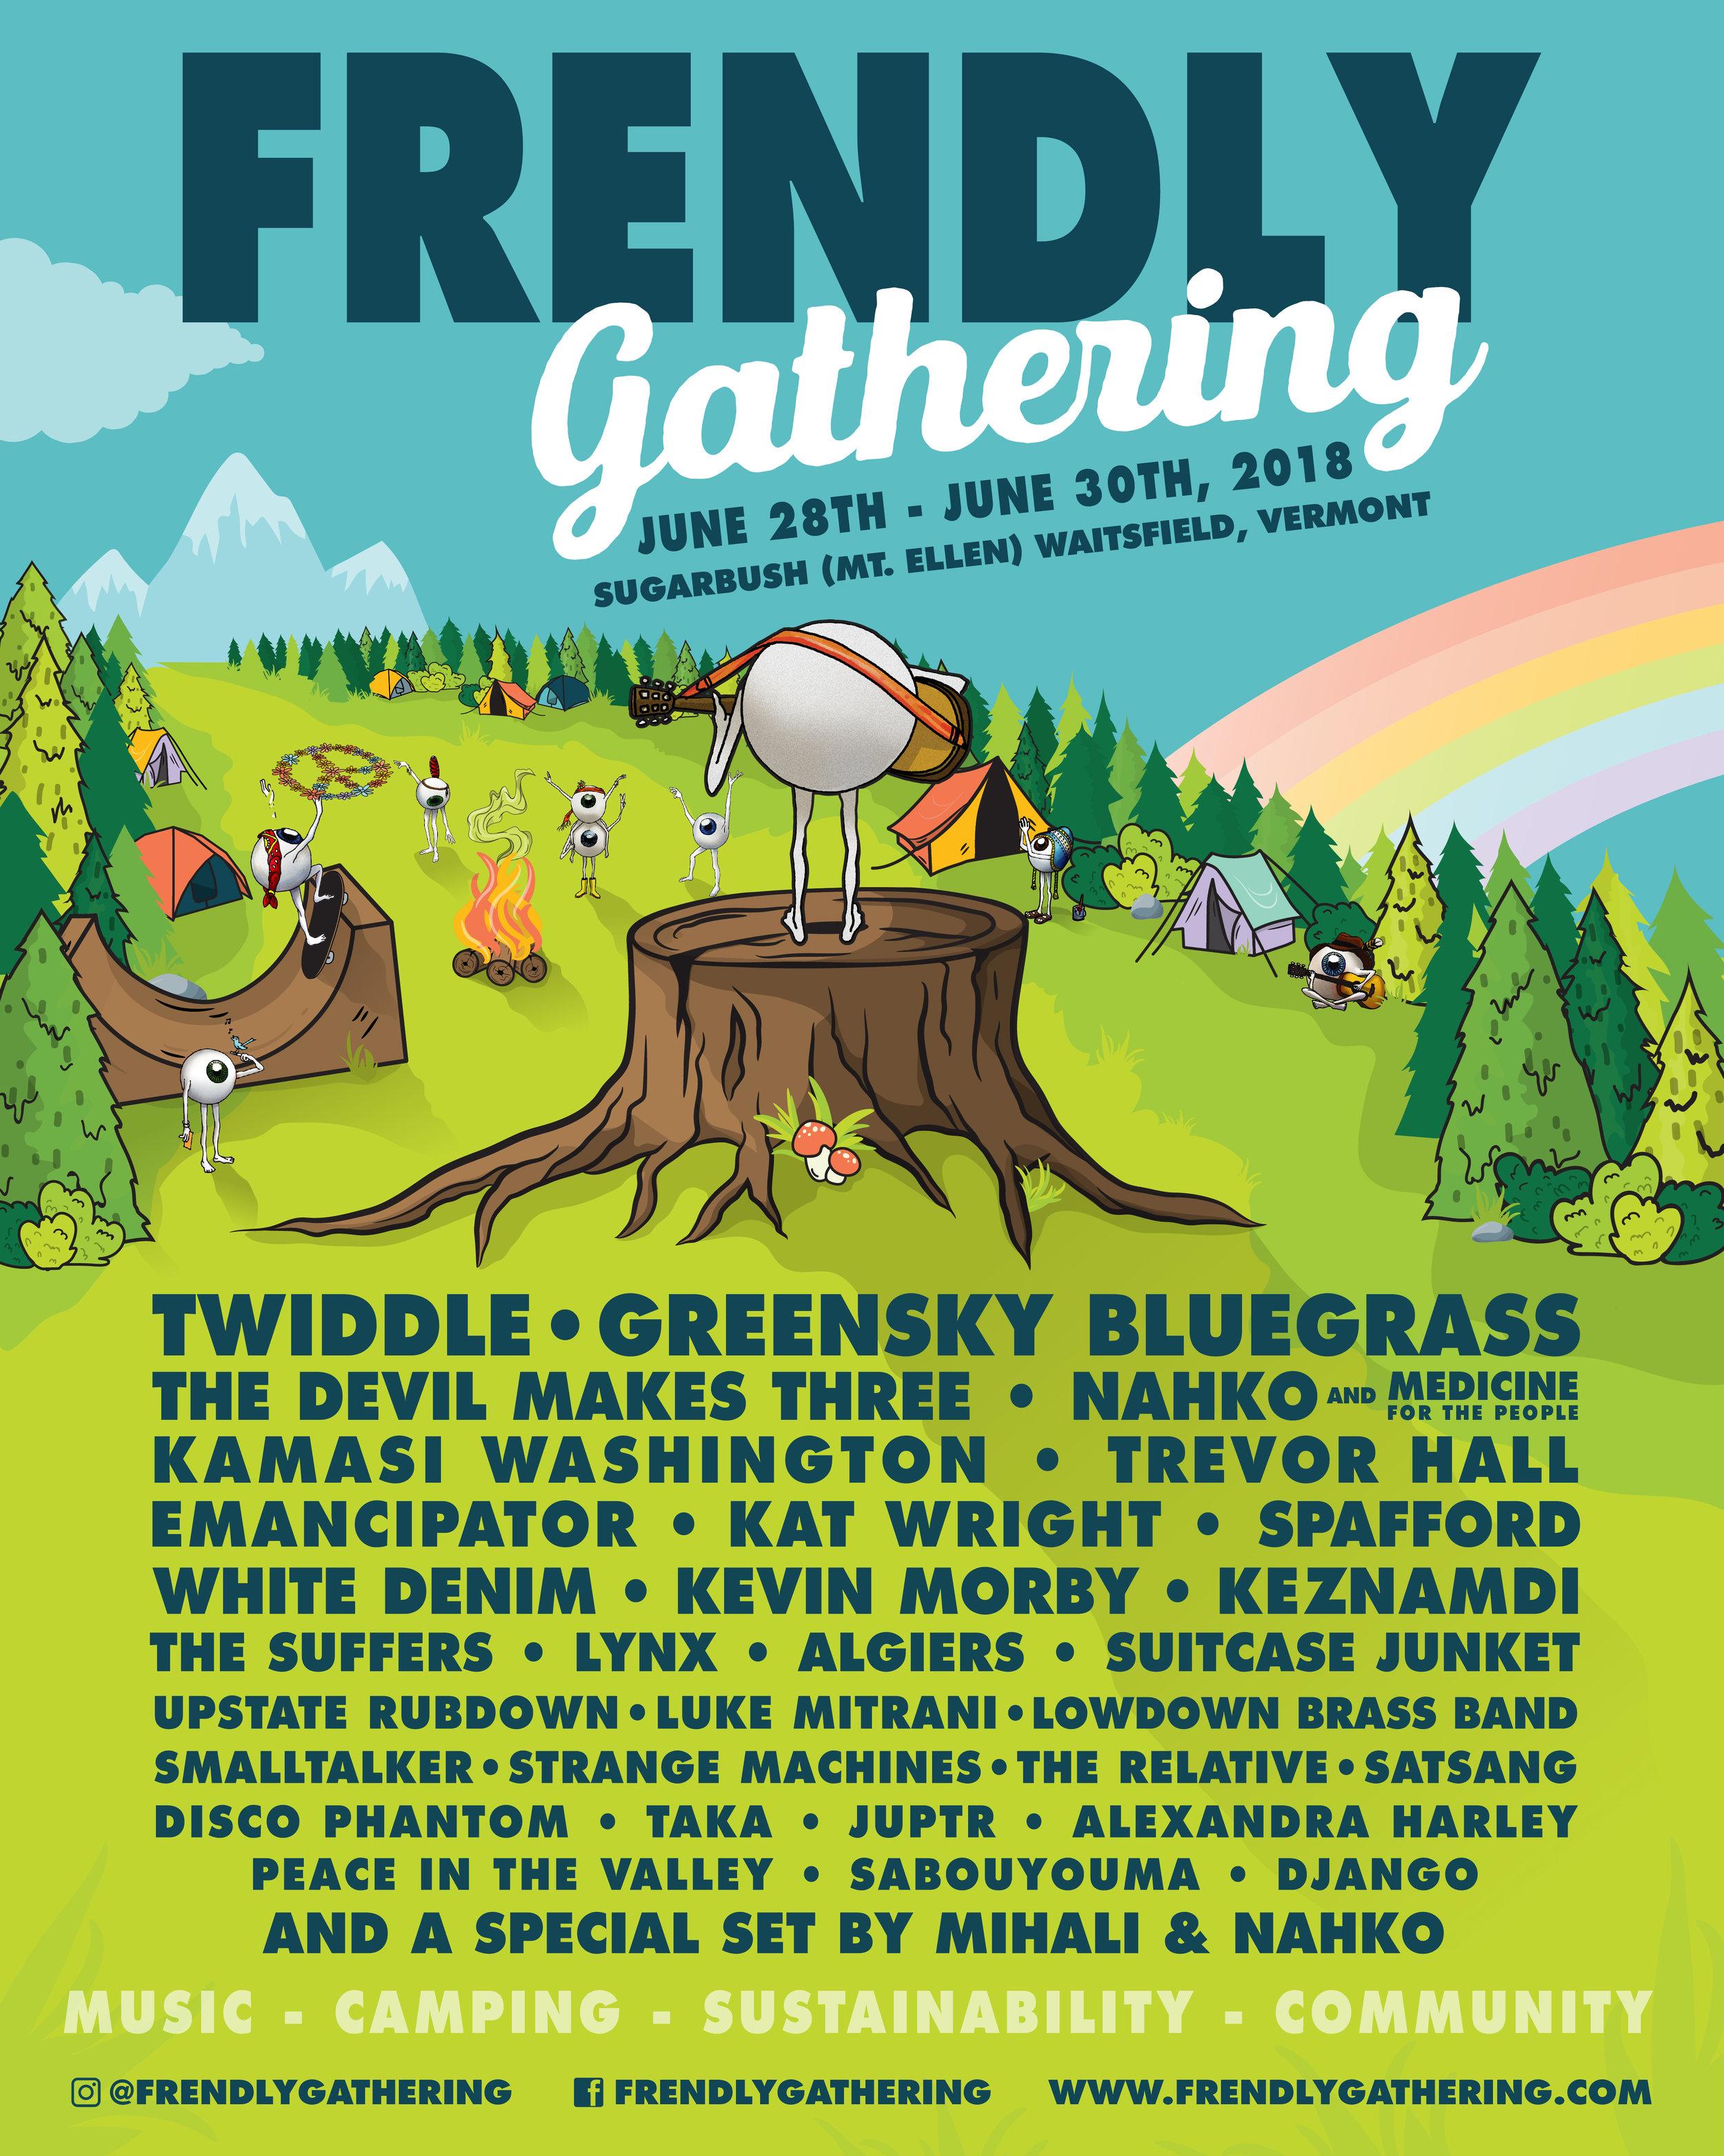 Frendly Gathering 2018 Lineup.jpg